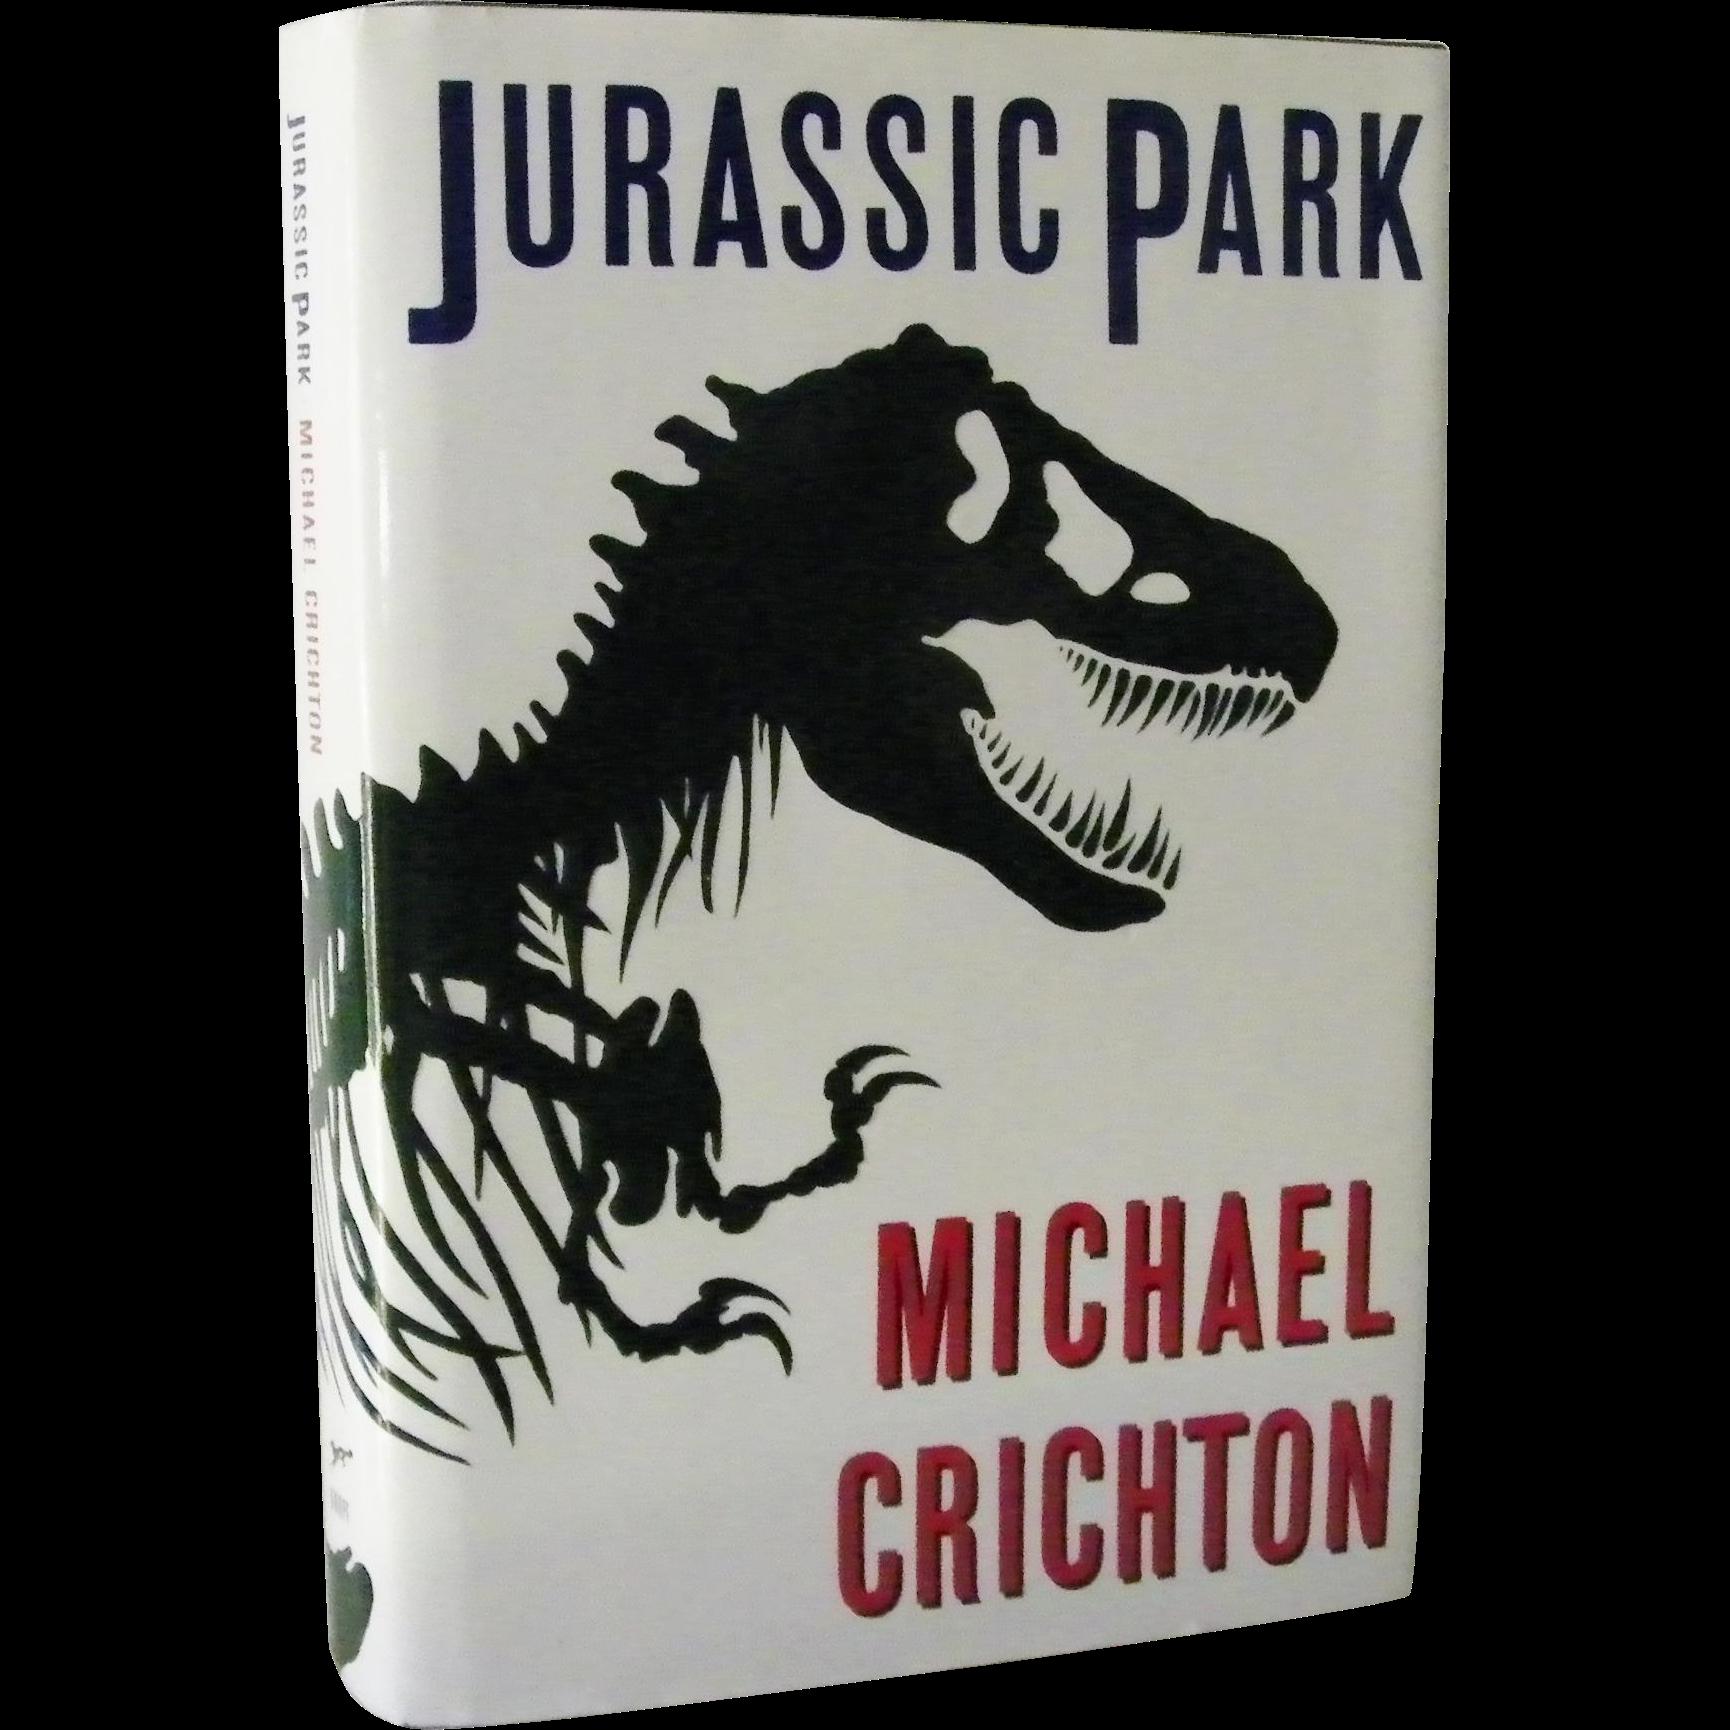 Jurassic Park by Michael Crichton 1st Edition 1st Print